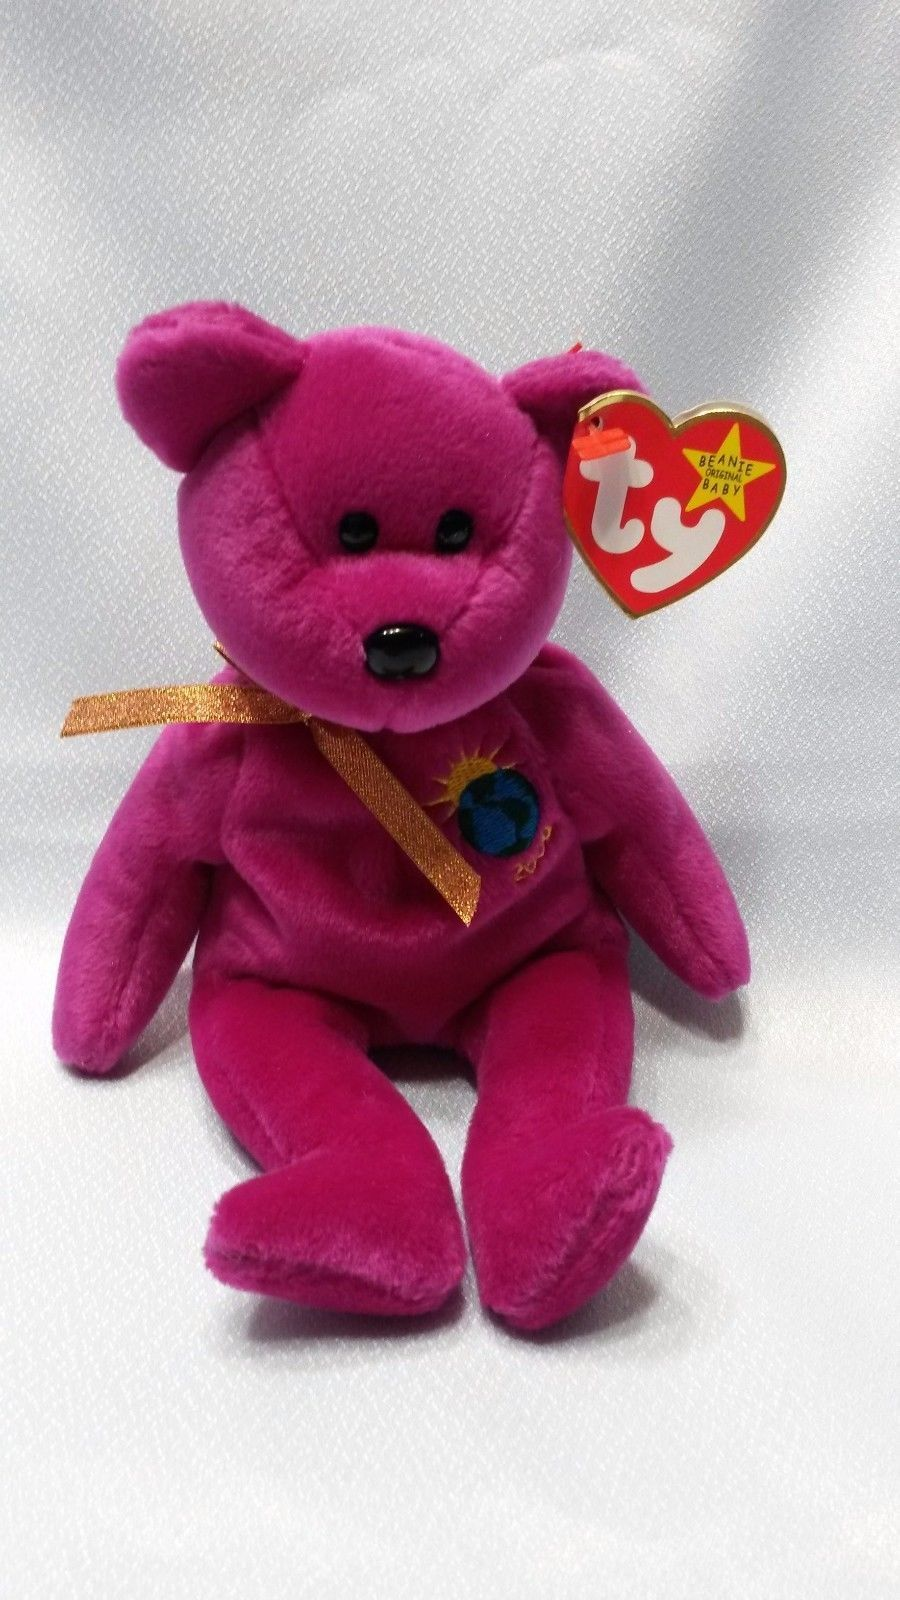 0a5d0a2110a Very Rare Ty Beanie Baby Bear With Errors Millenium Millennium Purple